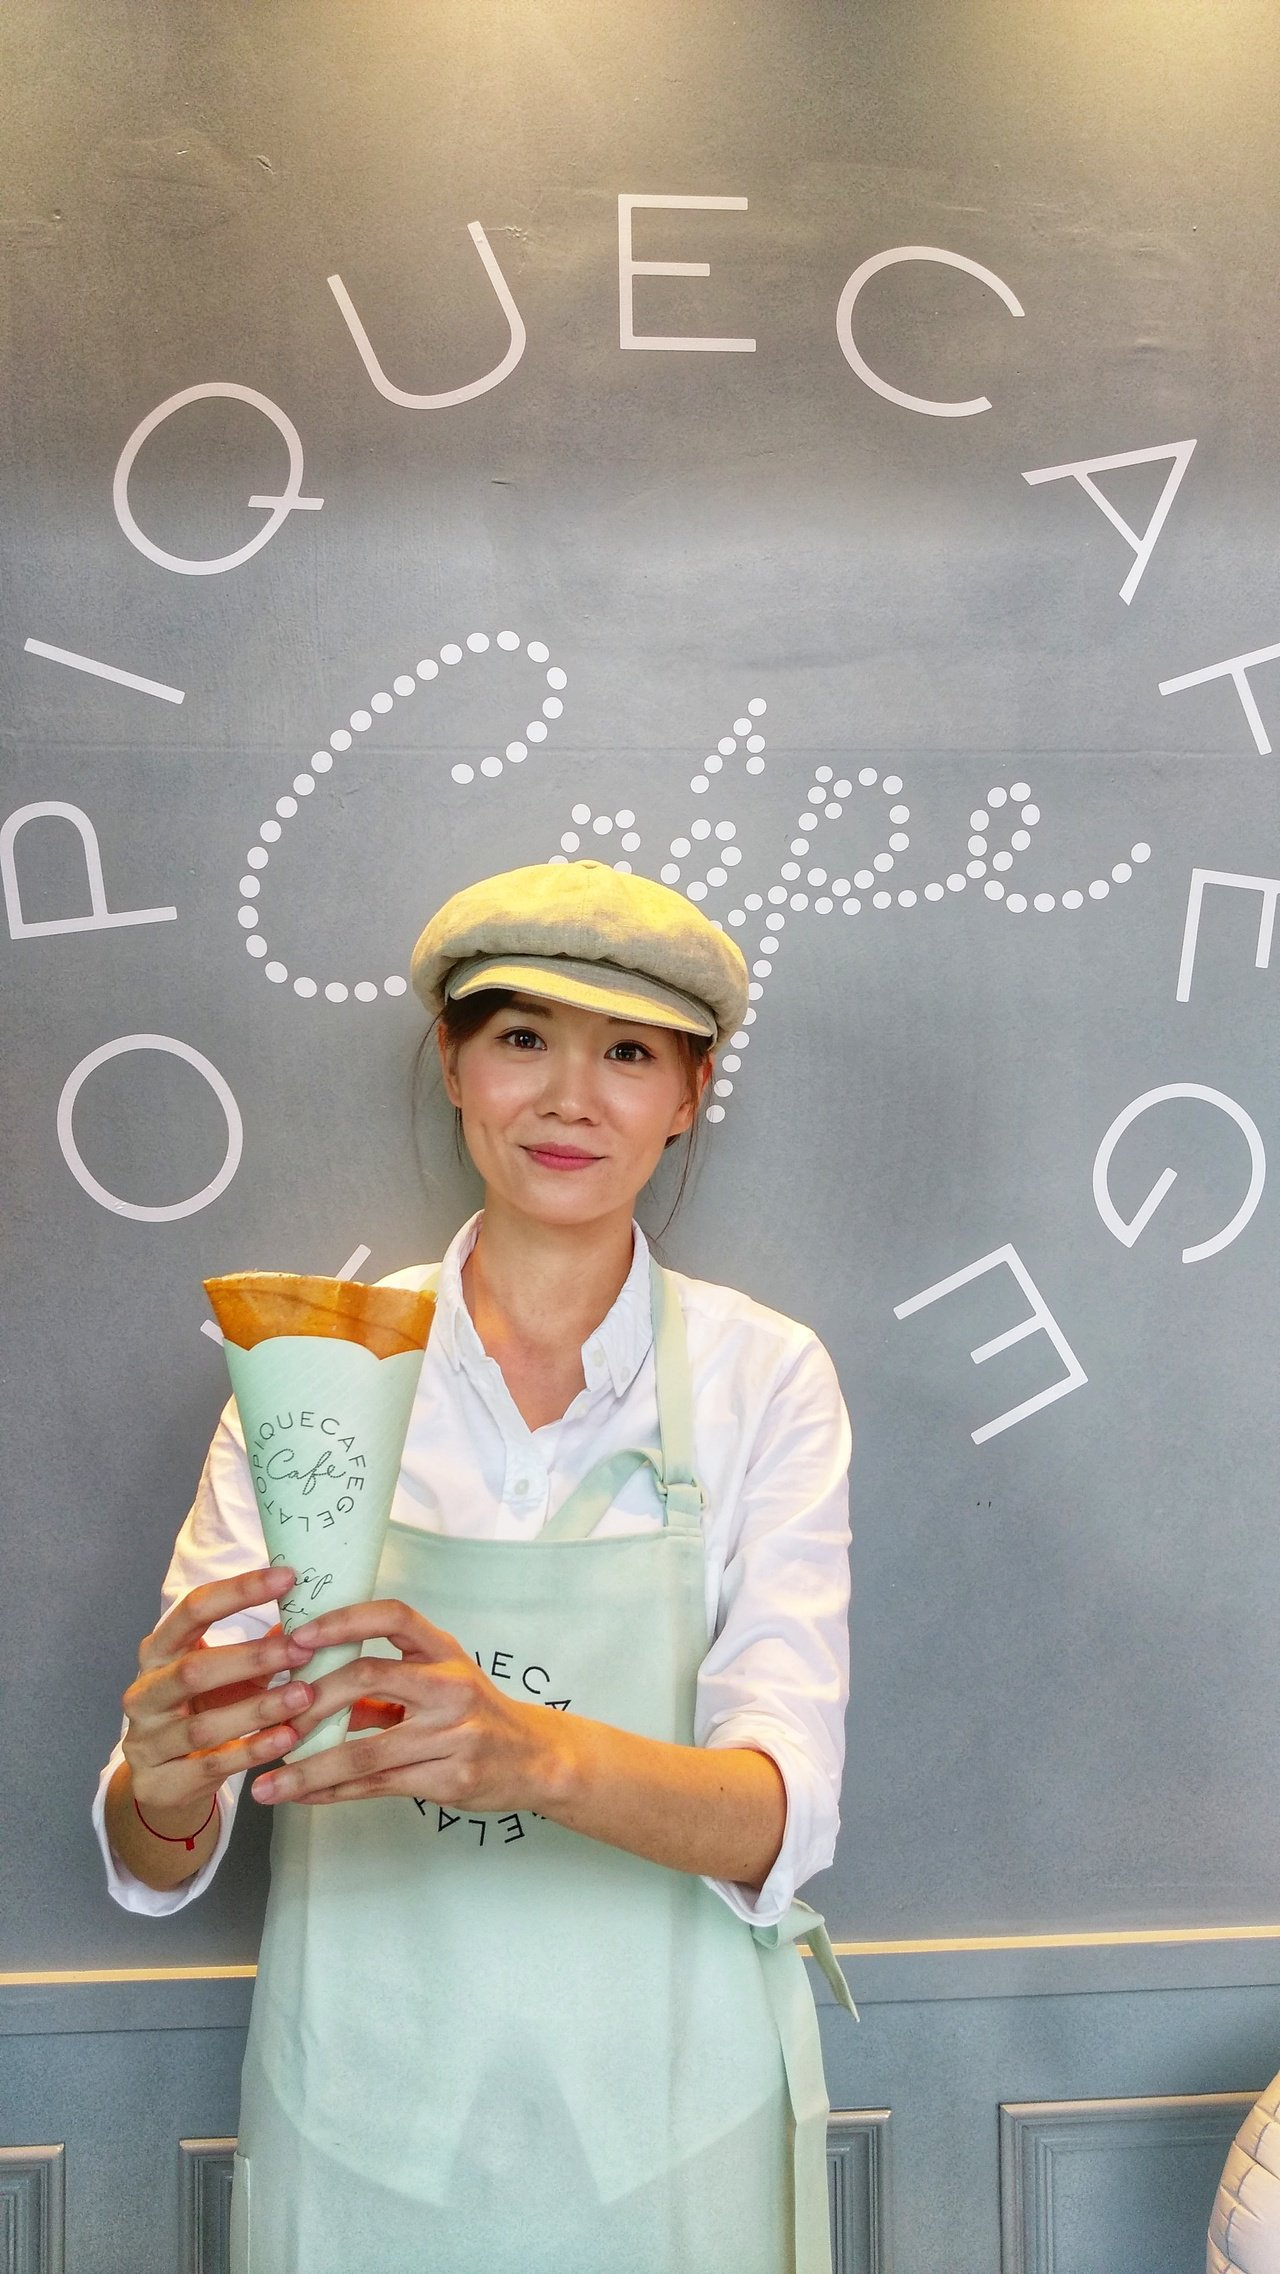 gelato pique cafe creperie法式可麗餅,結合台灣在地食材...